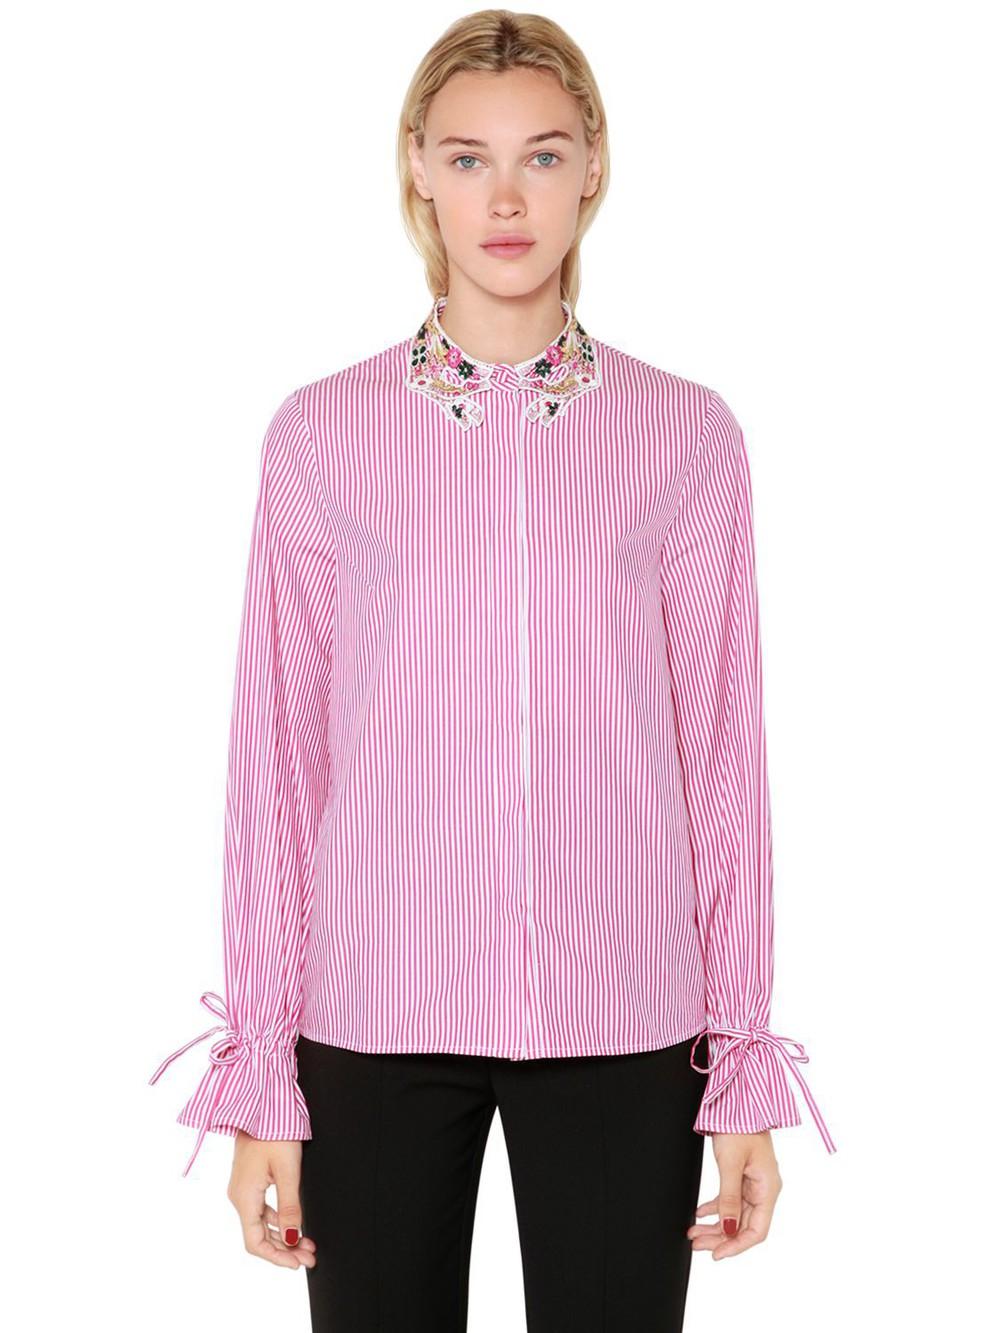 VIVETTA Lurex Lace Collar Striped Poplin Shirt in pink